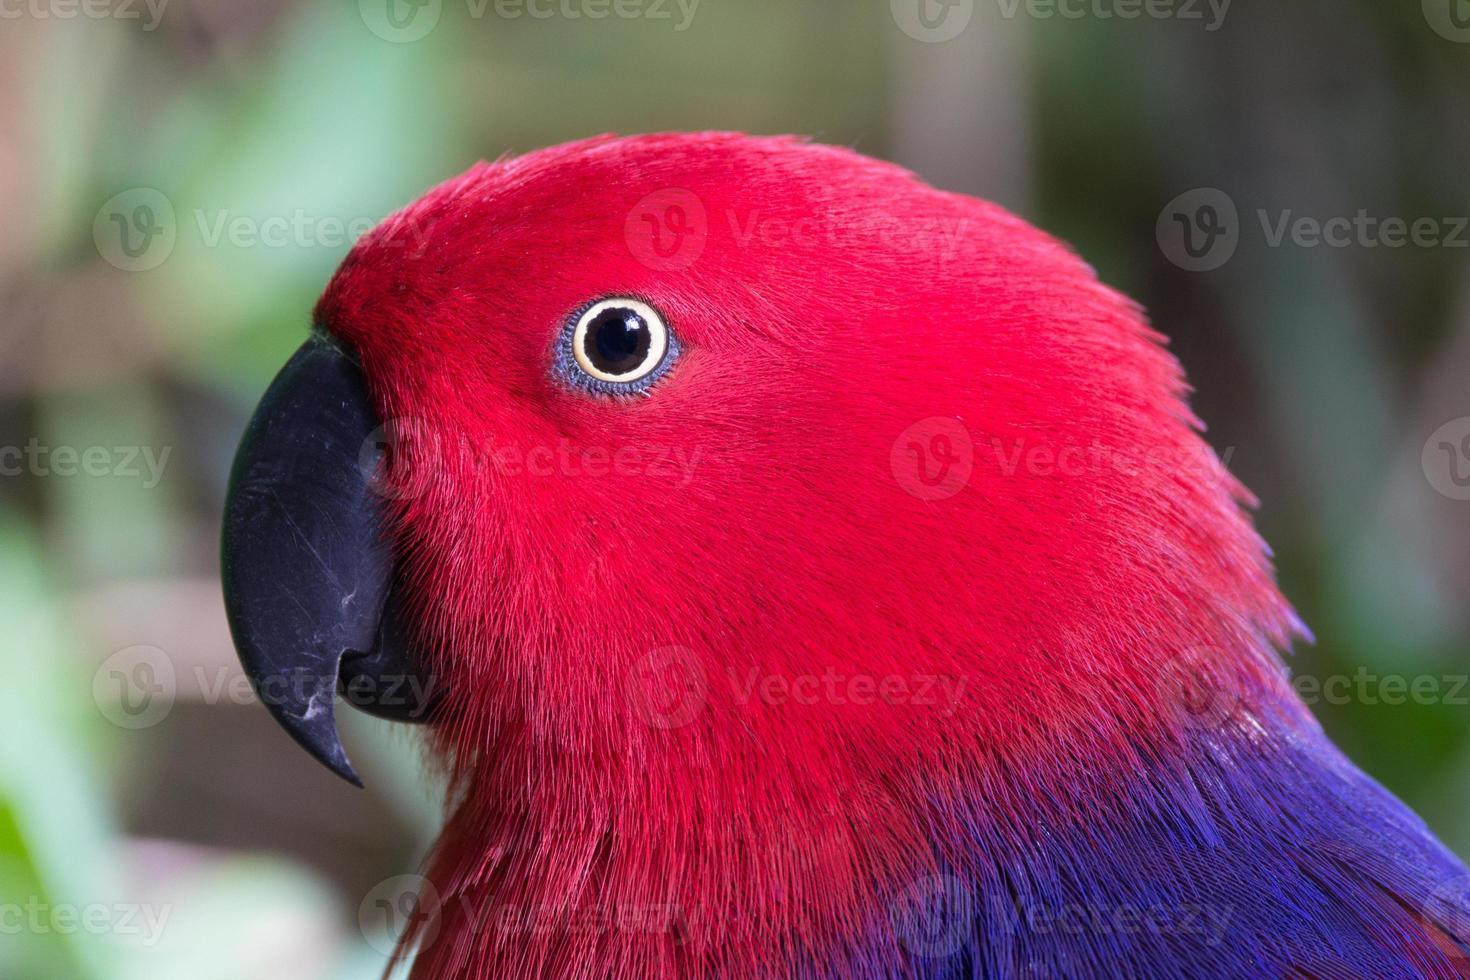 fêmea de papagaio eclectus foto